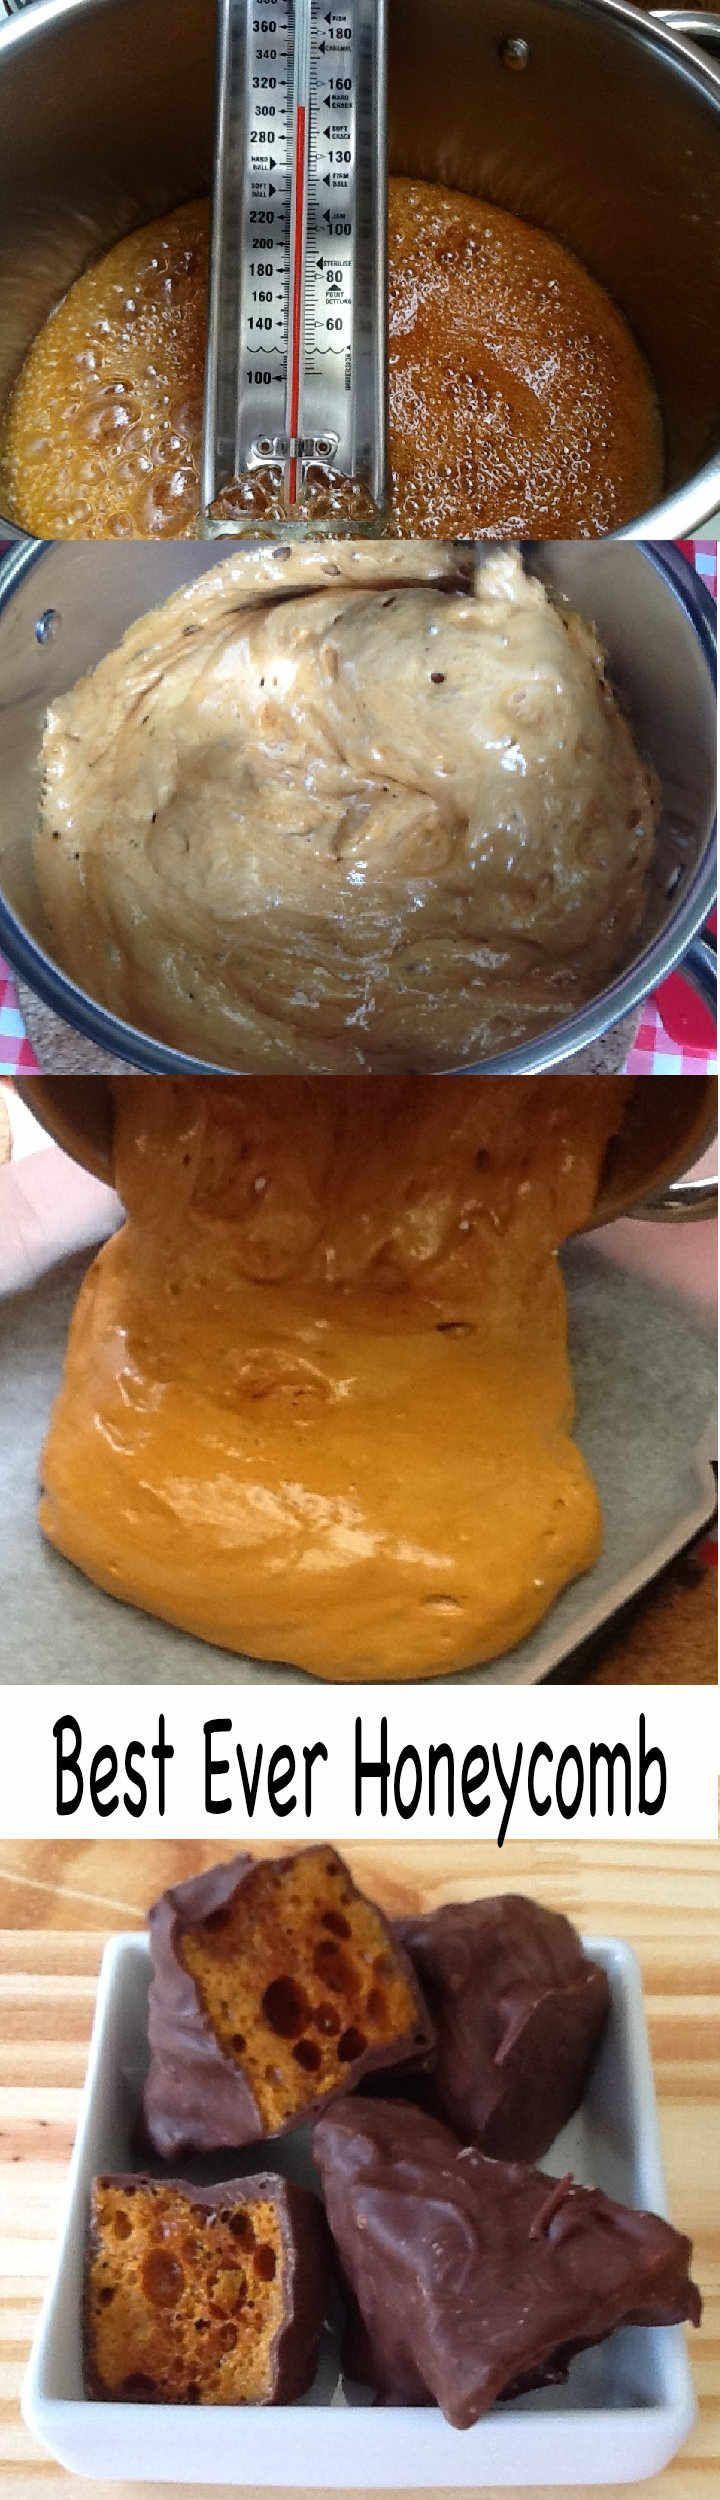 how to make honeycomb cake